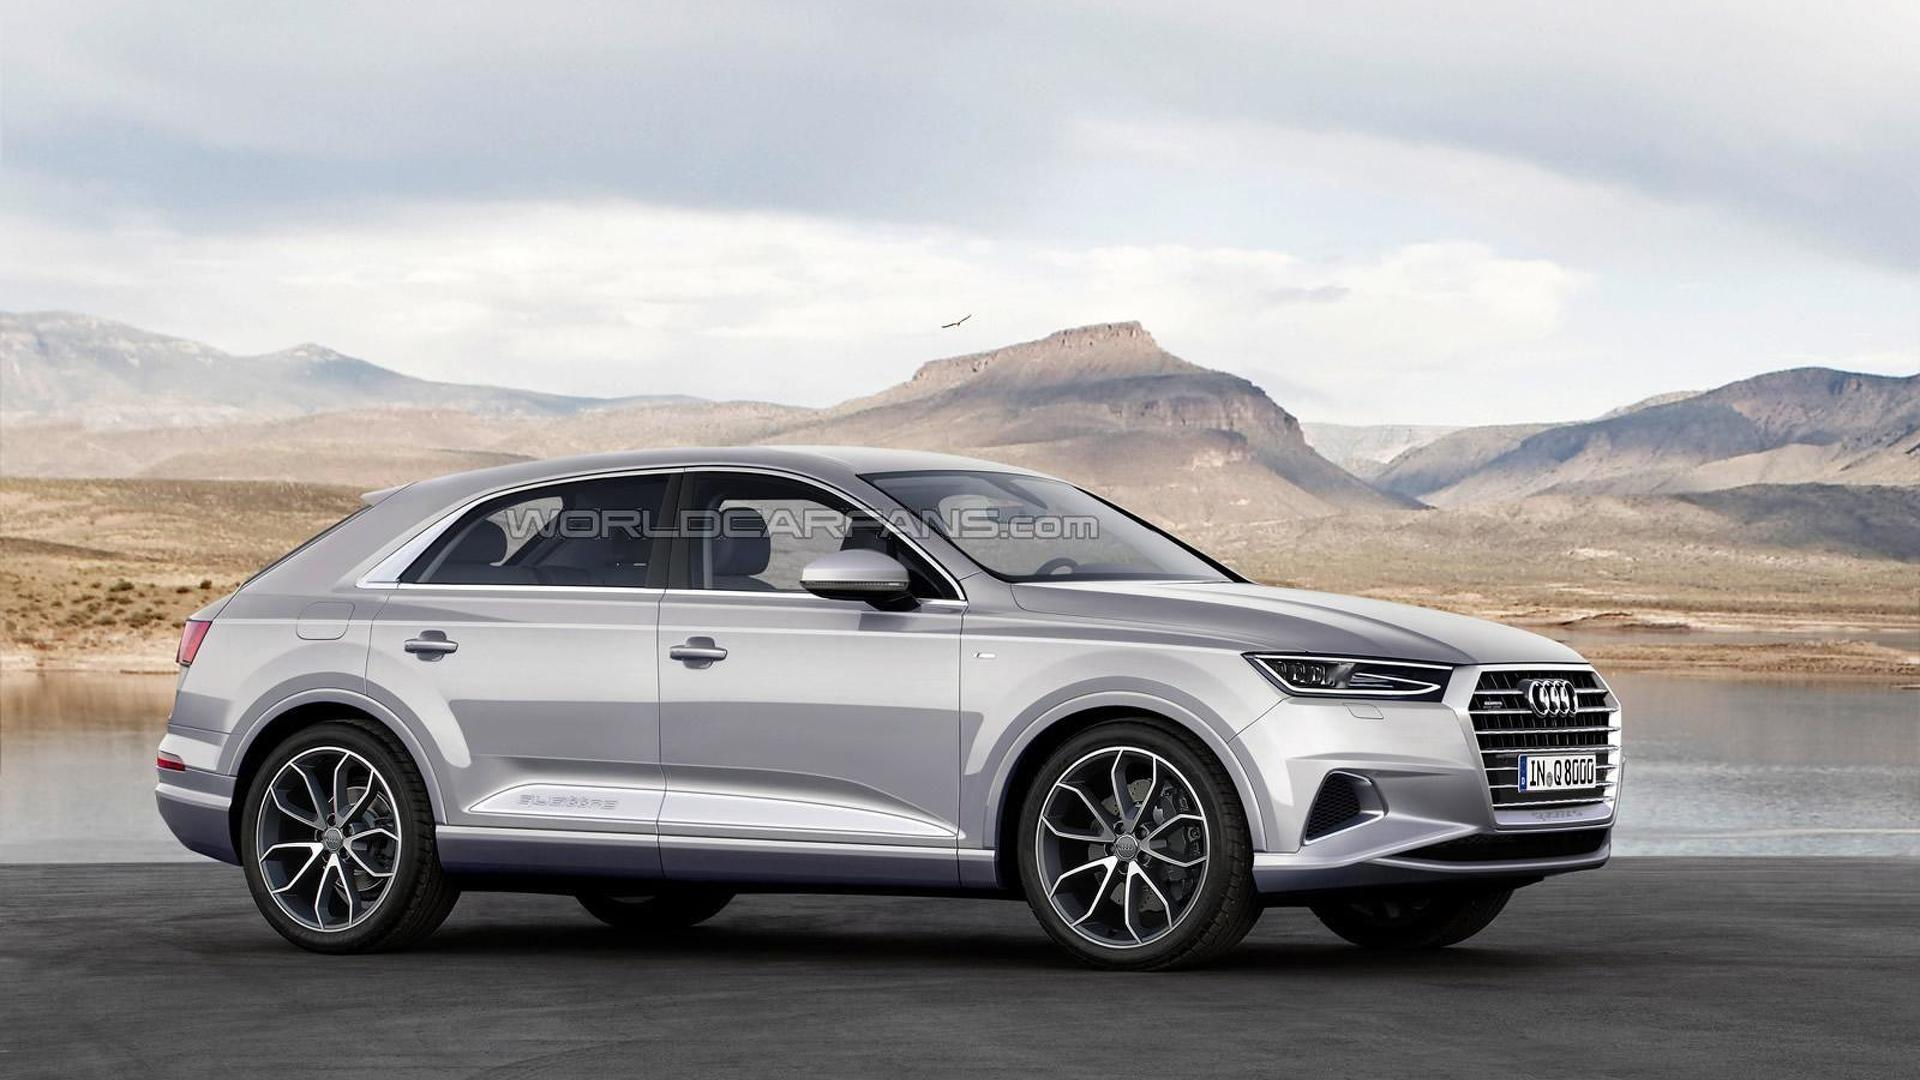 2019 Audi Q8 speculatively rendered